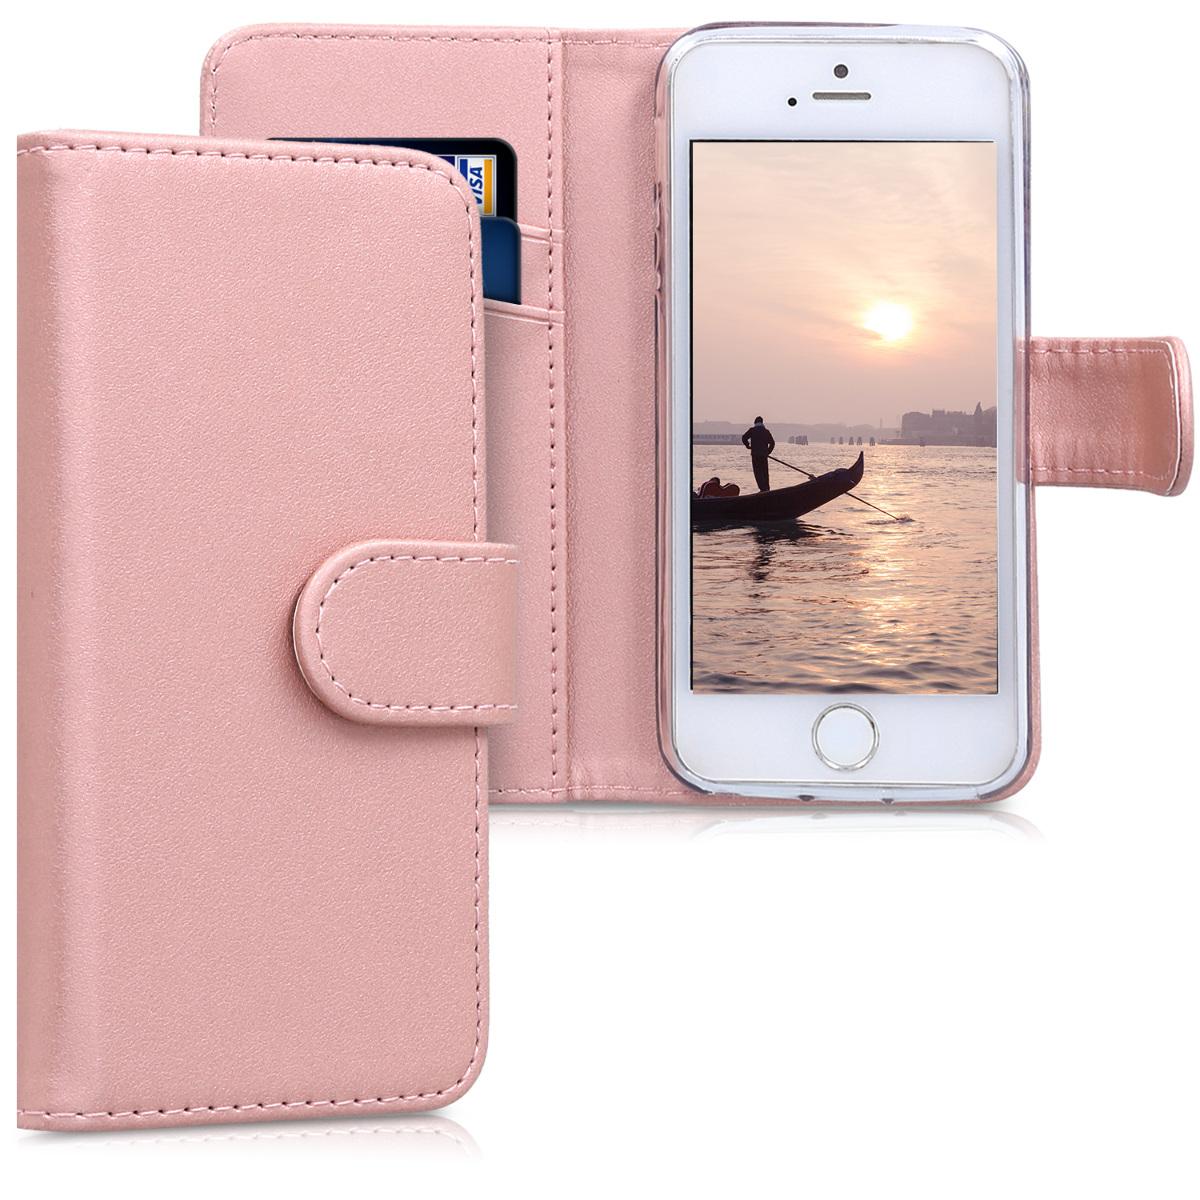 KW Θήκη Πορτοφόλι Apple iPhone SE / 5 / 5S - Pink (12261.81)